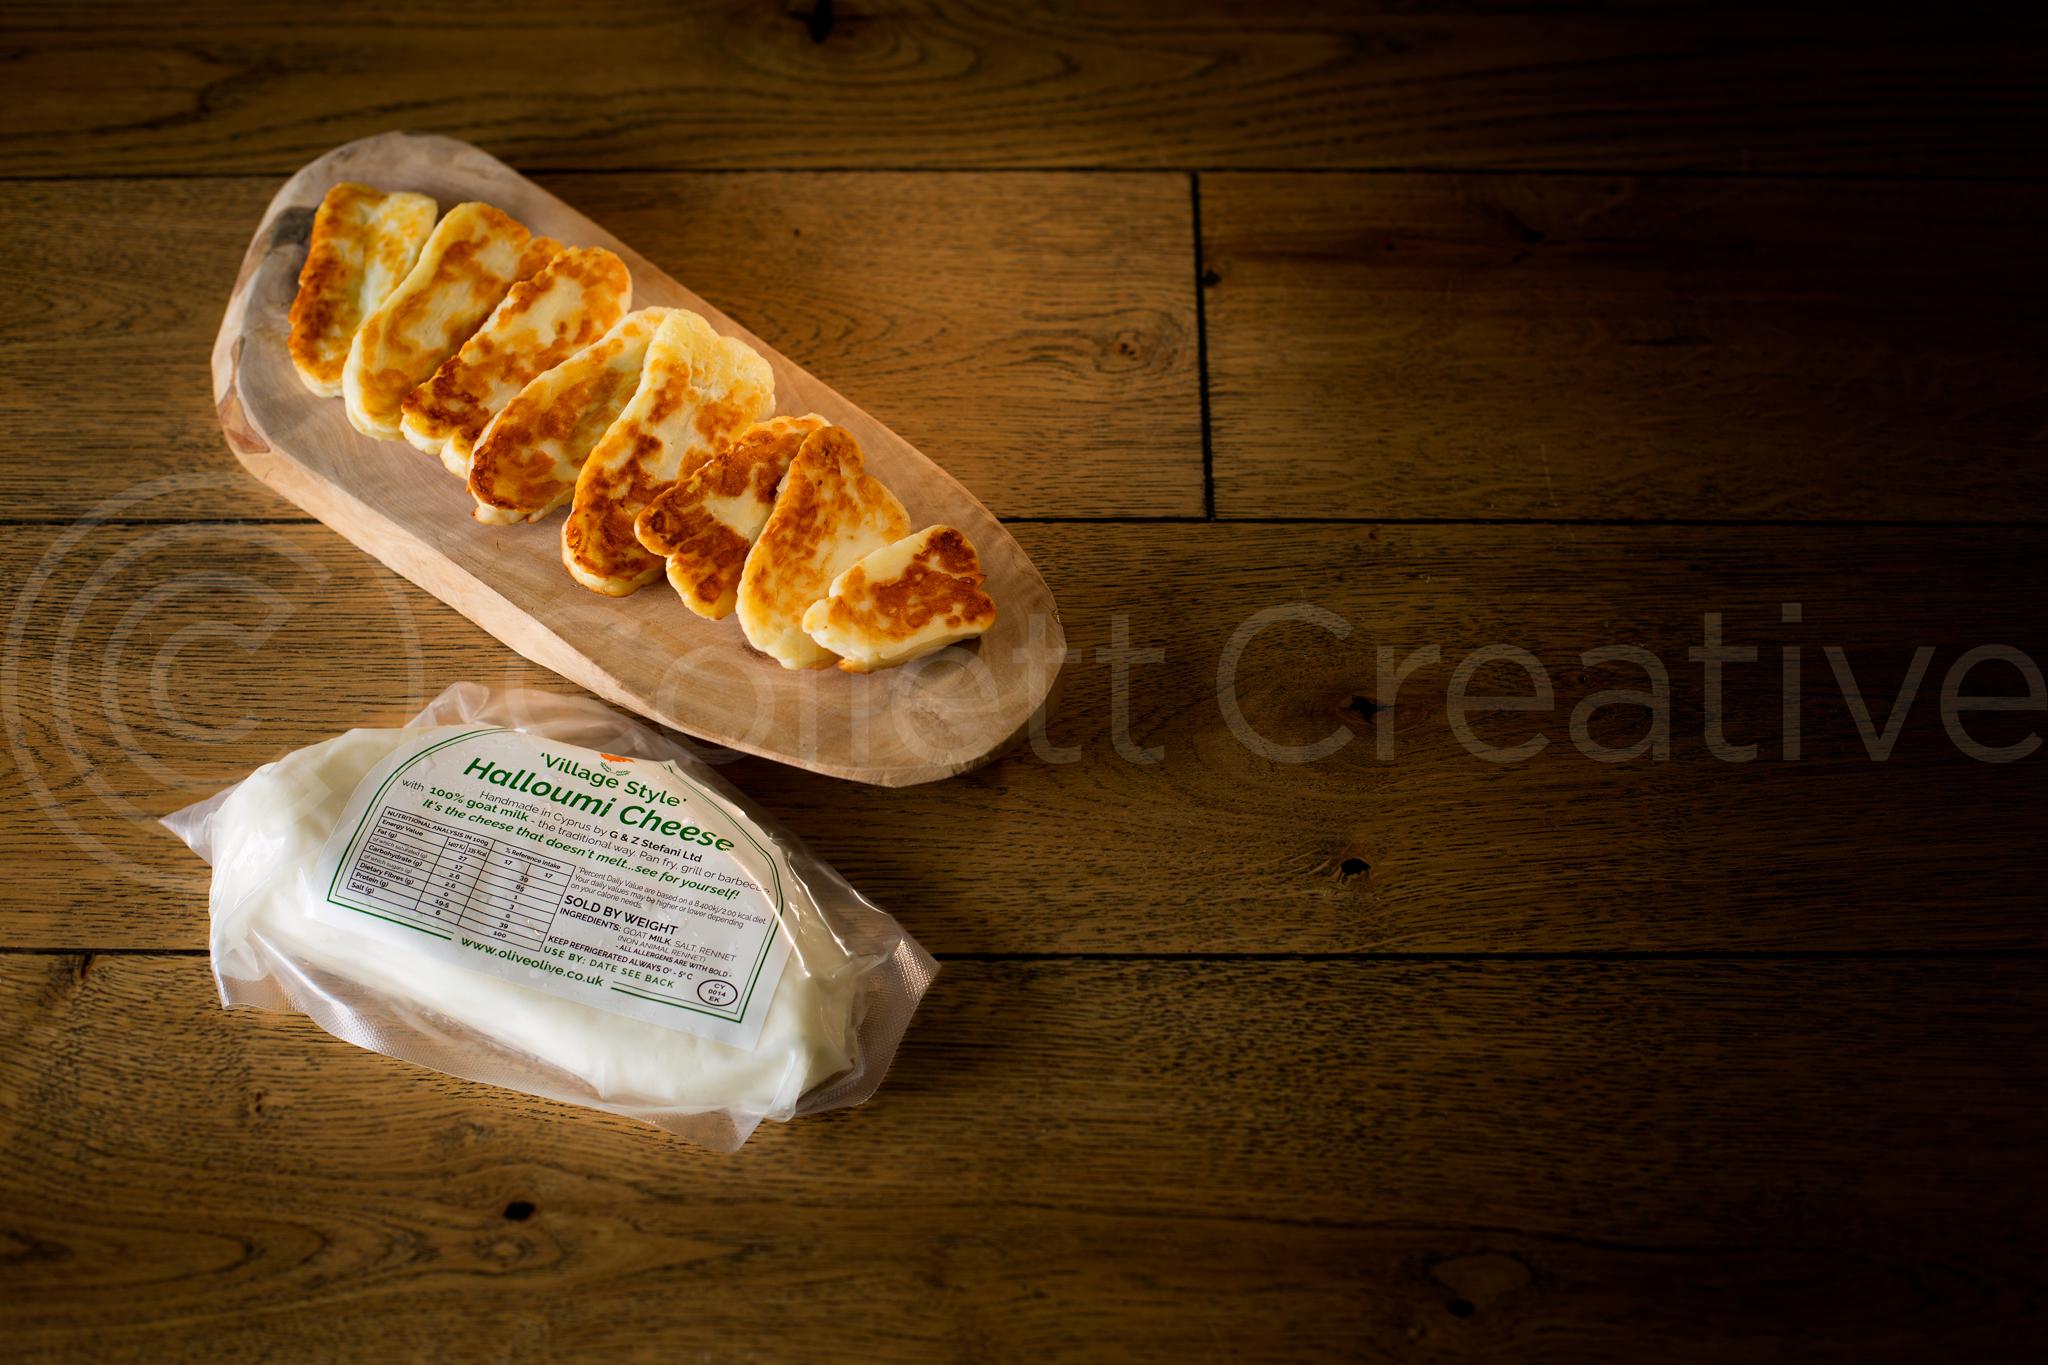 Final Halloumi Cheese Image